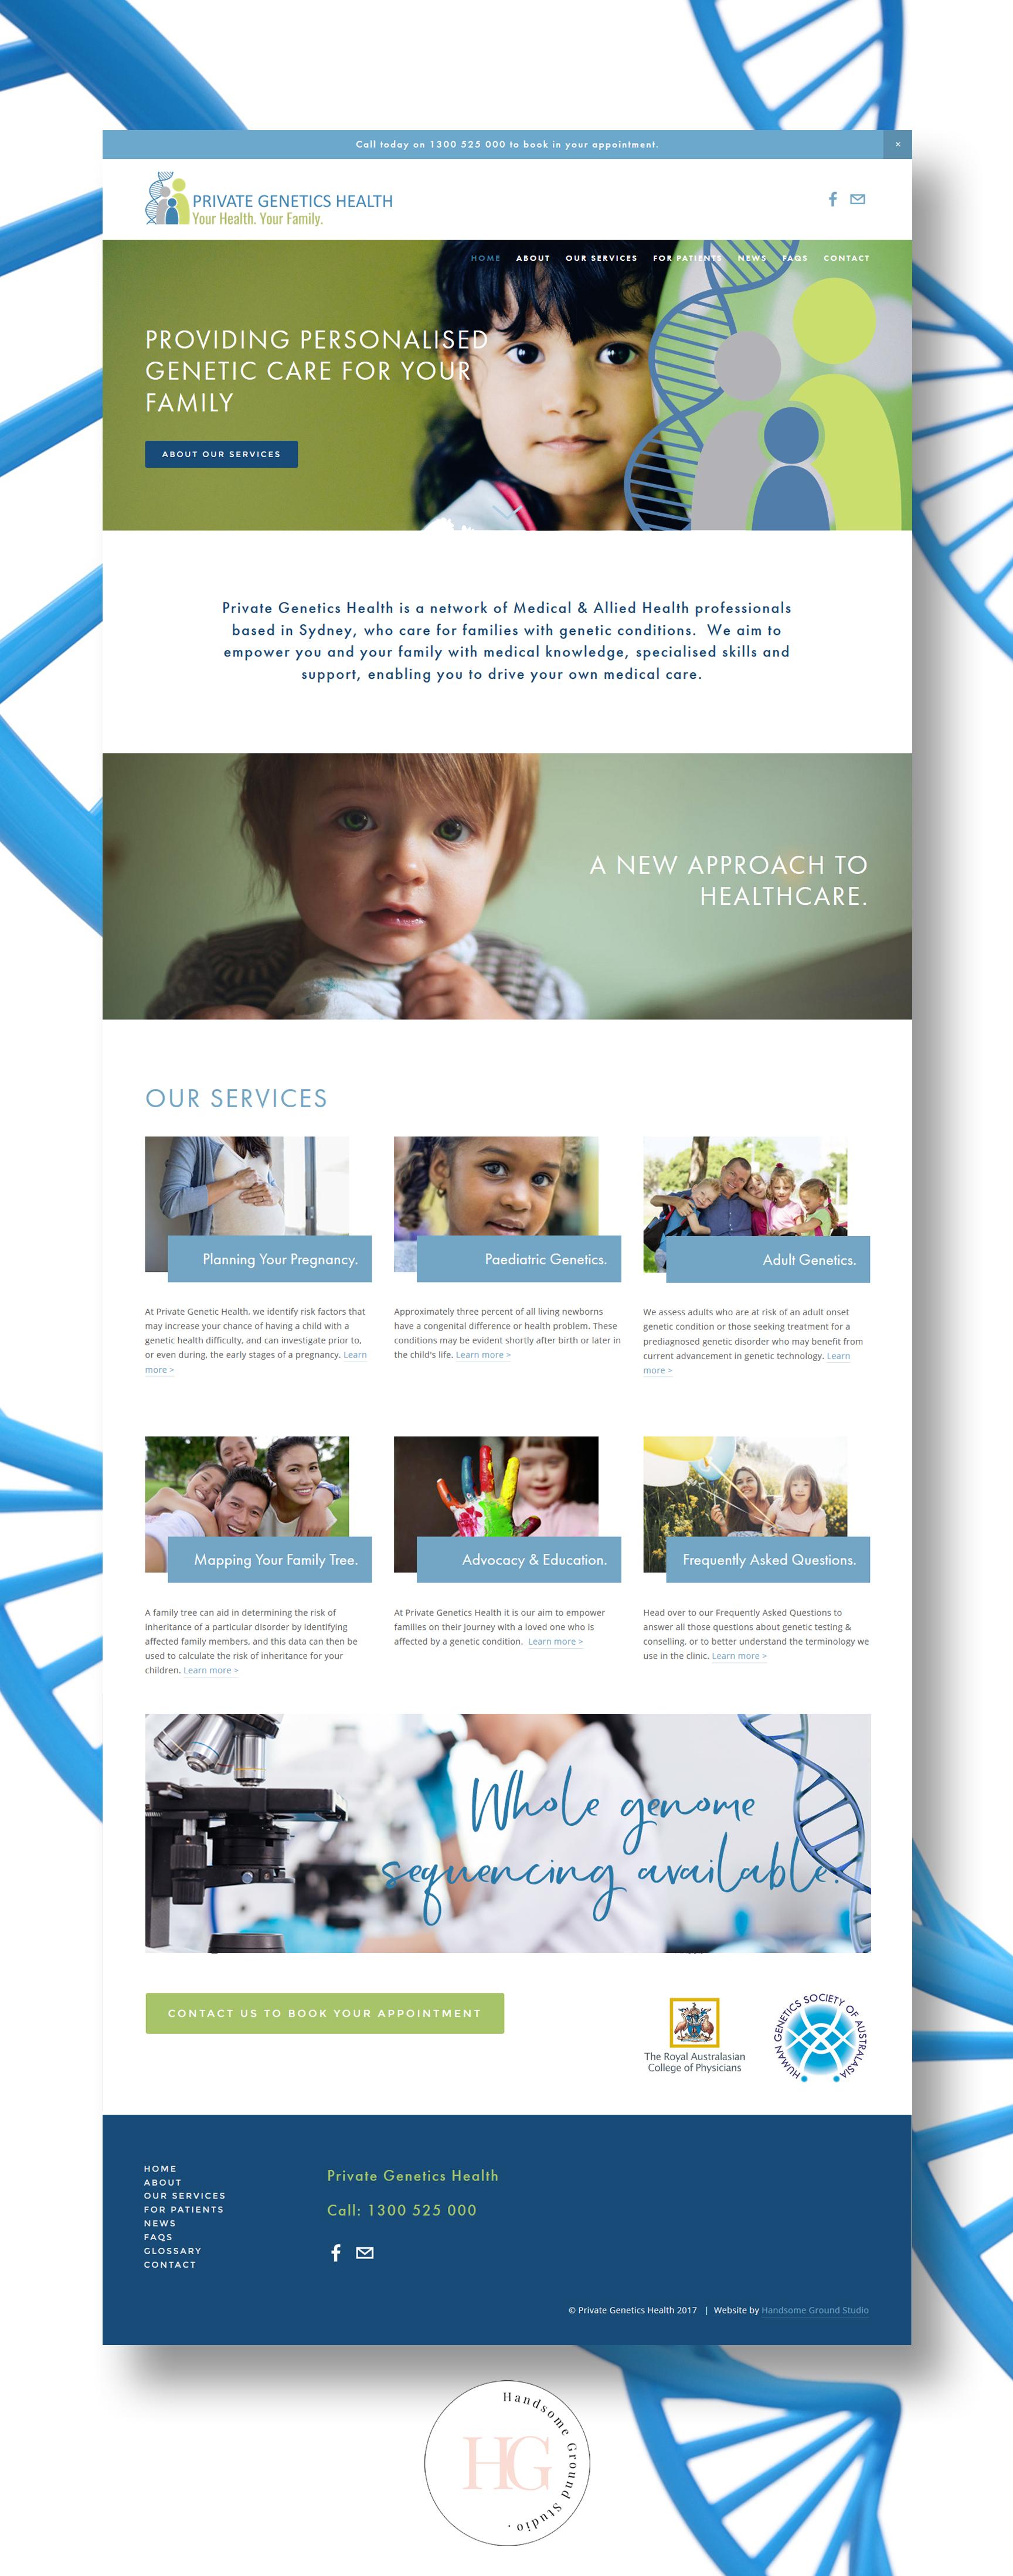 Website Design for Private Genetics Health Sydney.